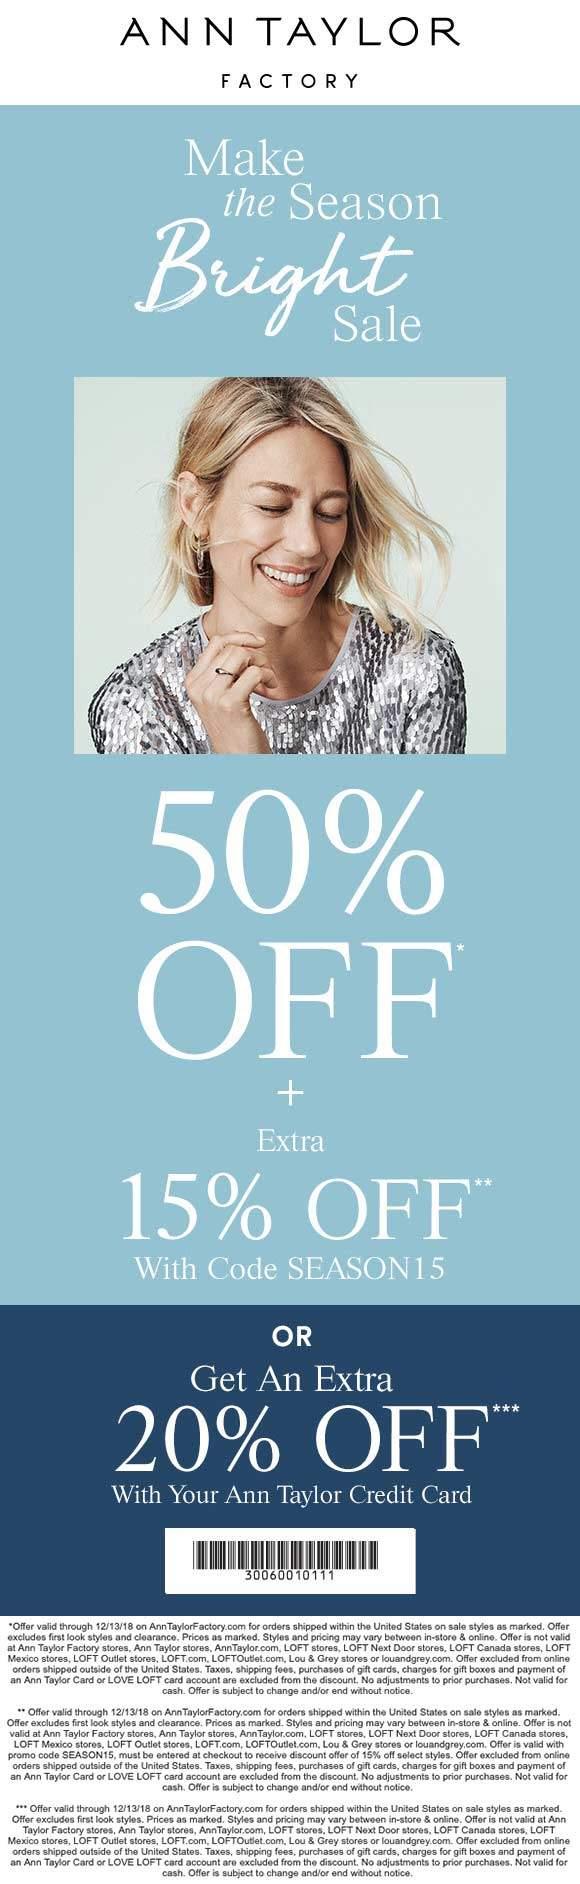 Ann Taylor Factory Coupon May 2020 65% off online at Ann Taylor Factory via promo code SEASON15